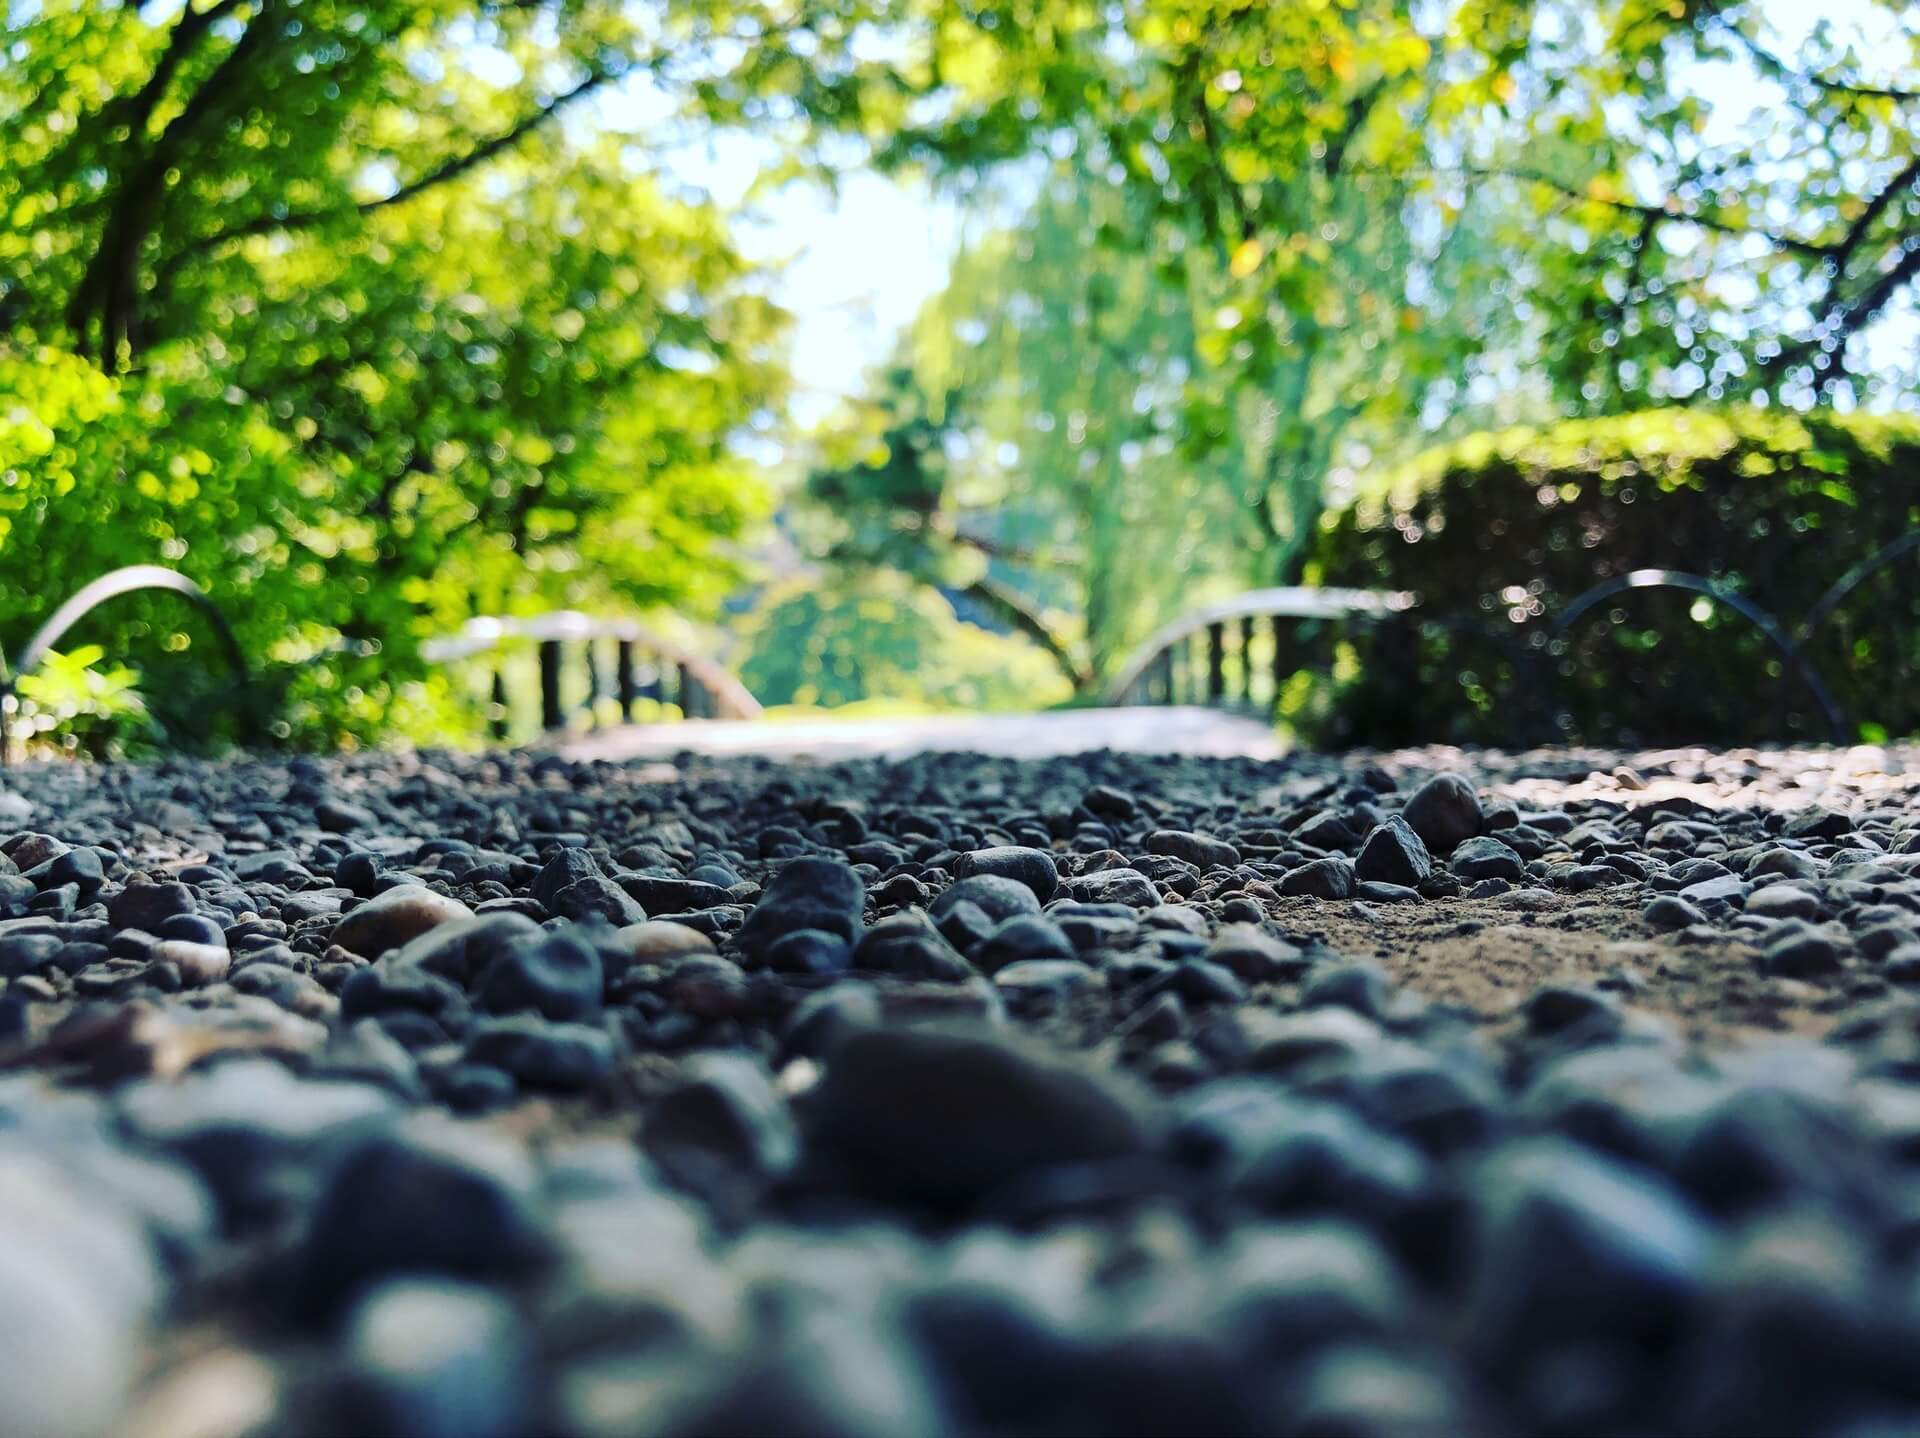 piedras de jardin